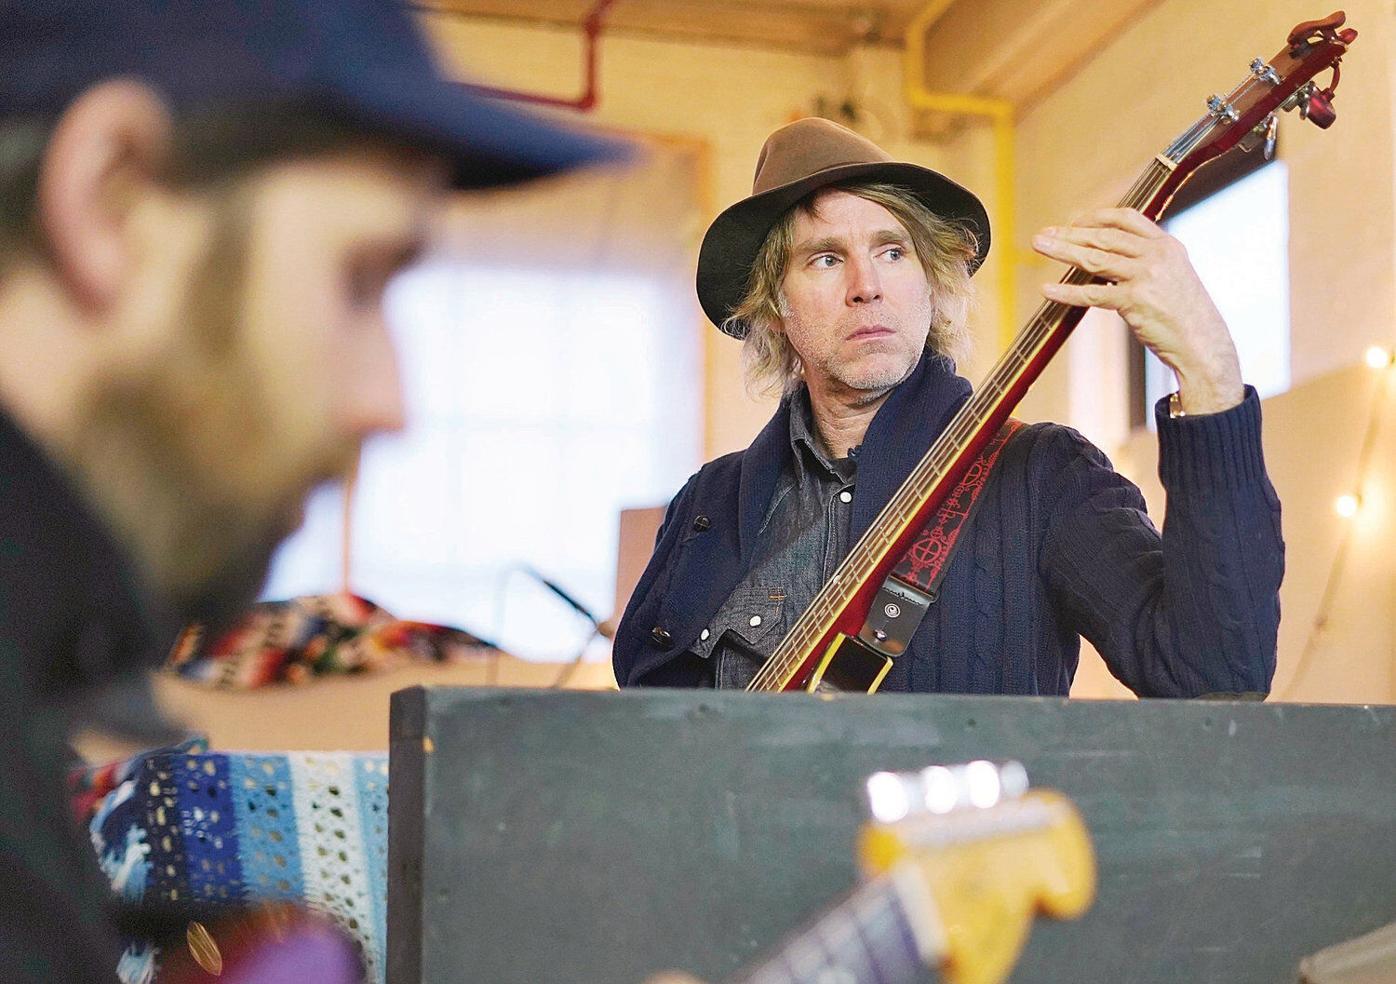 The Whiskey Treaty Roadshow recording begins with the rhythm